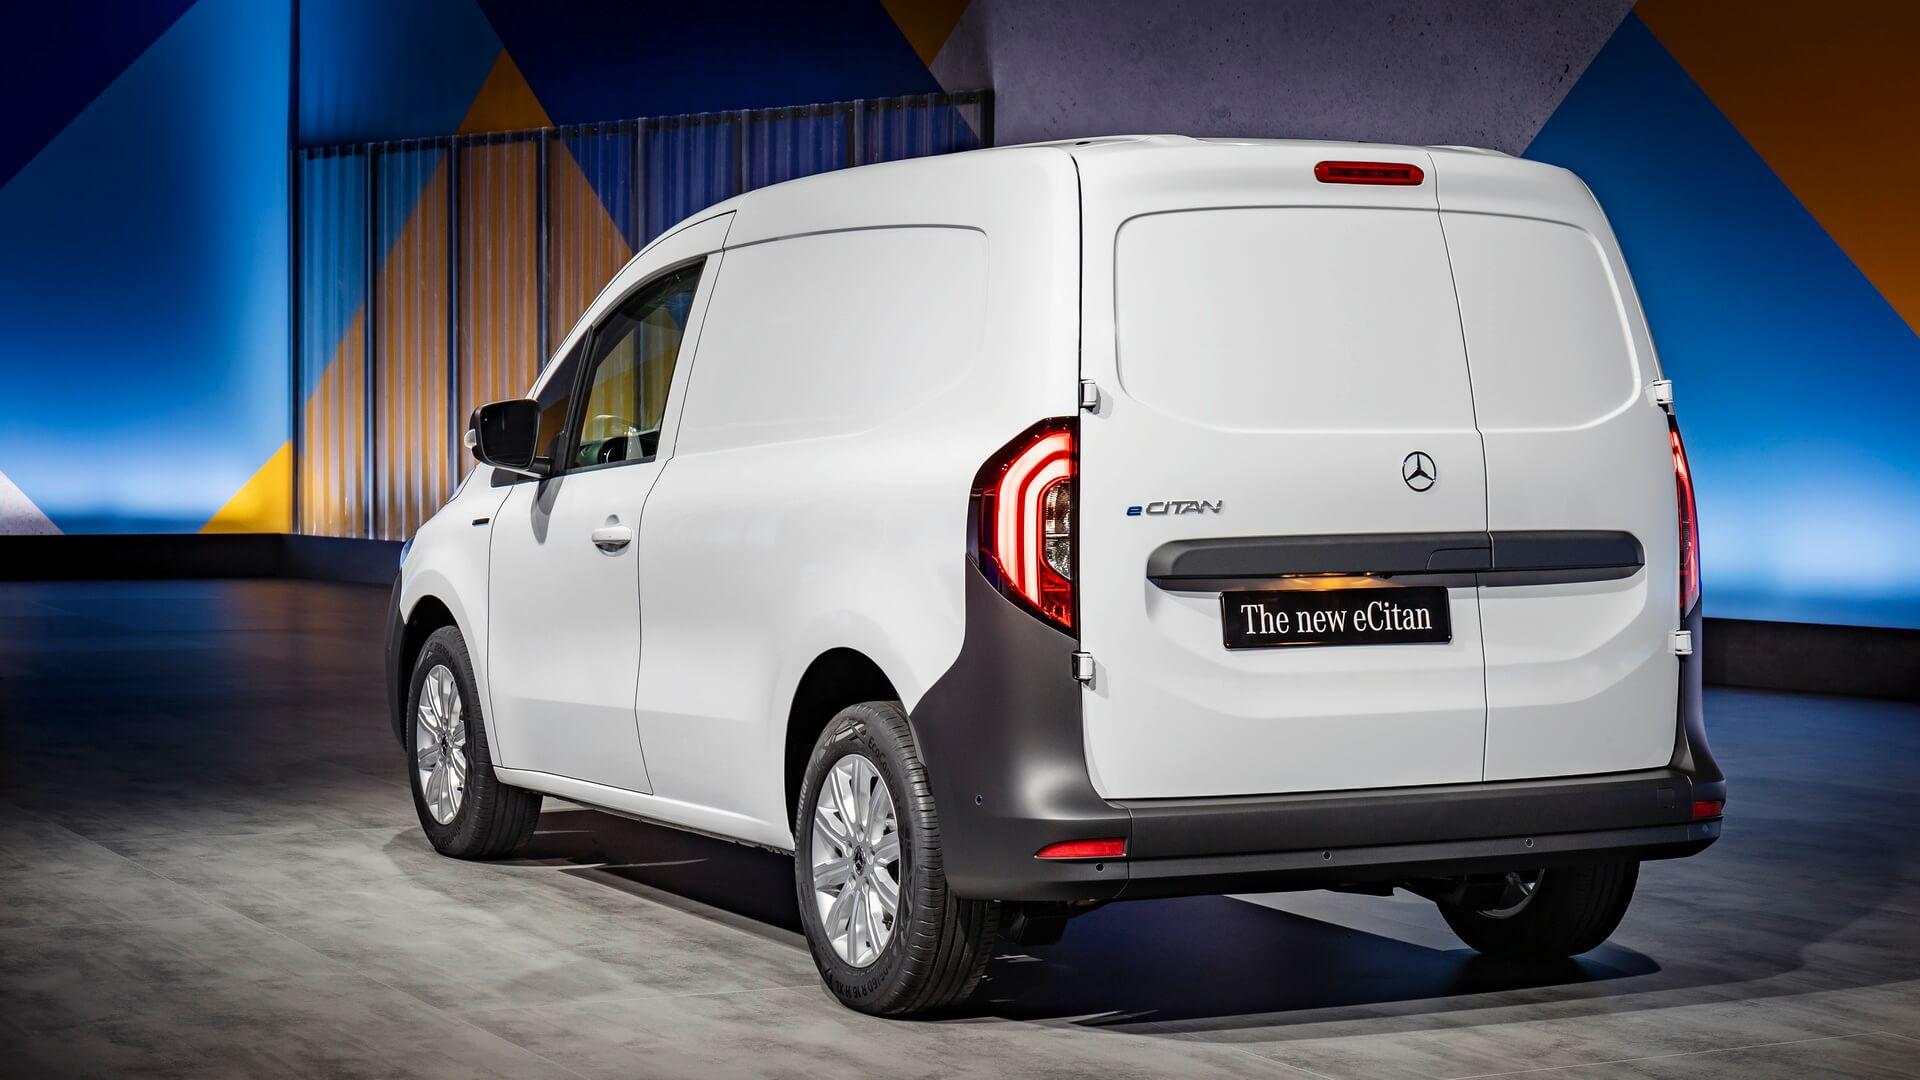 Электрофургон Mercedes-Benz eCitan присоединяется к eVito и eSprinter